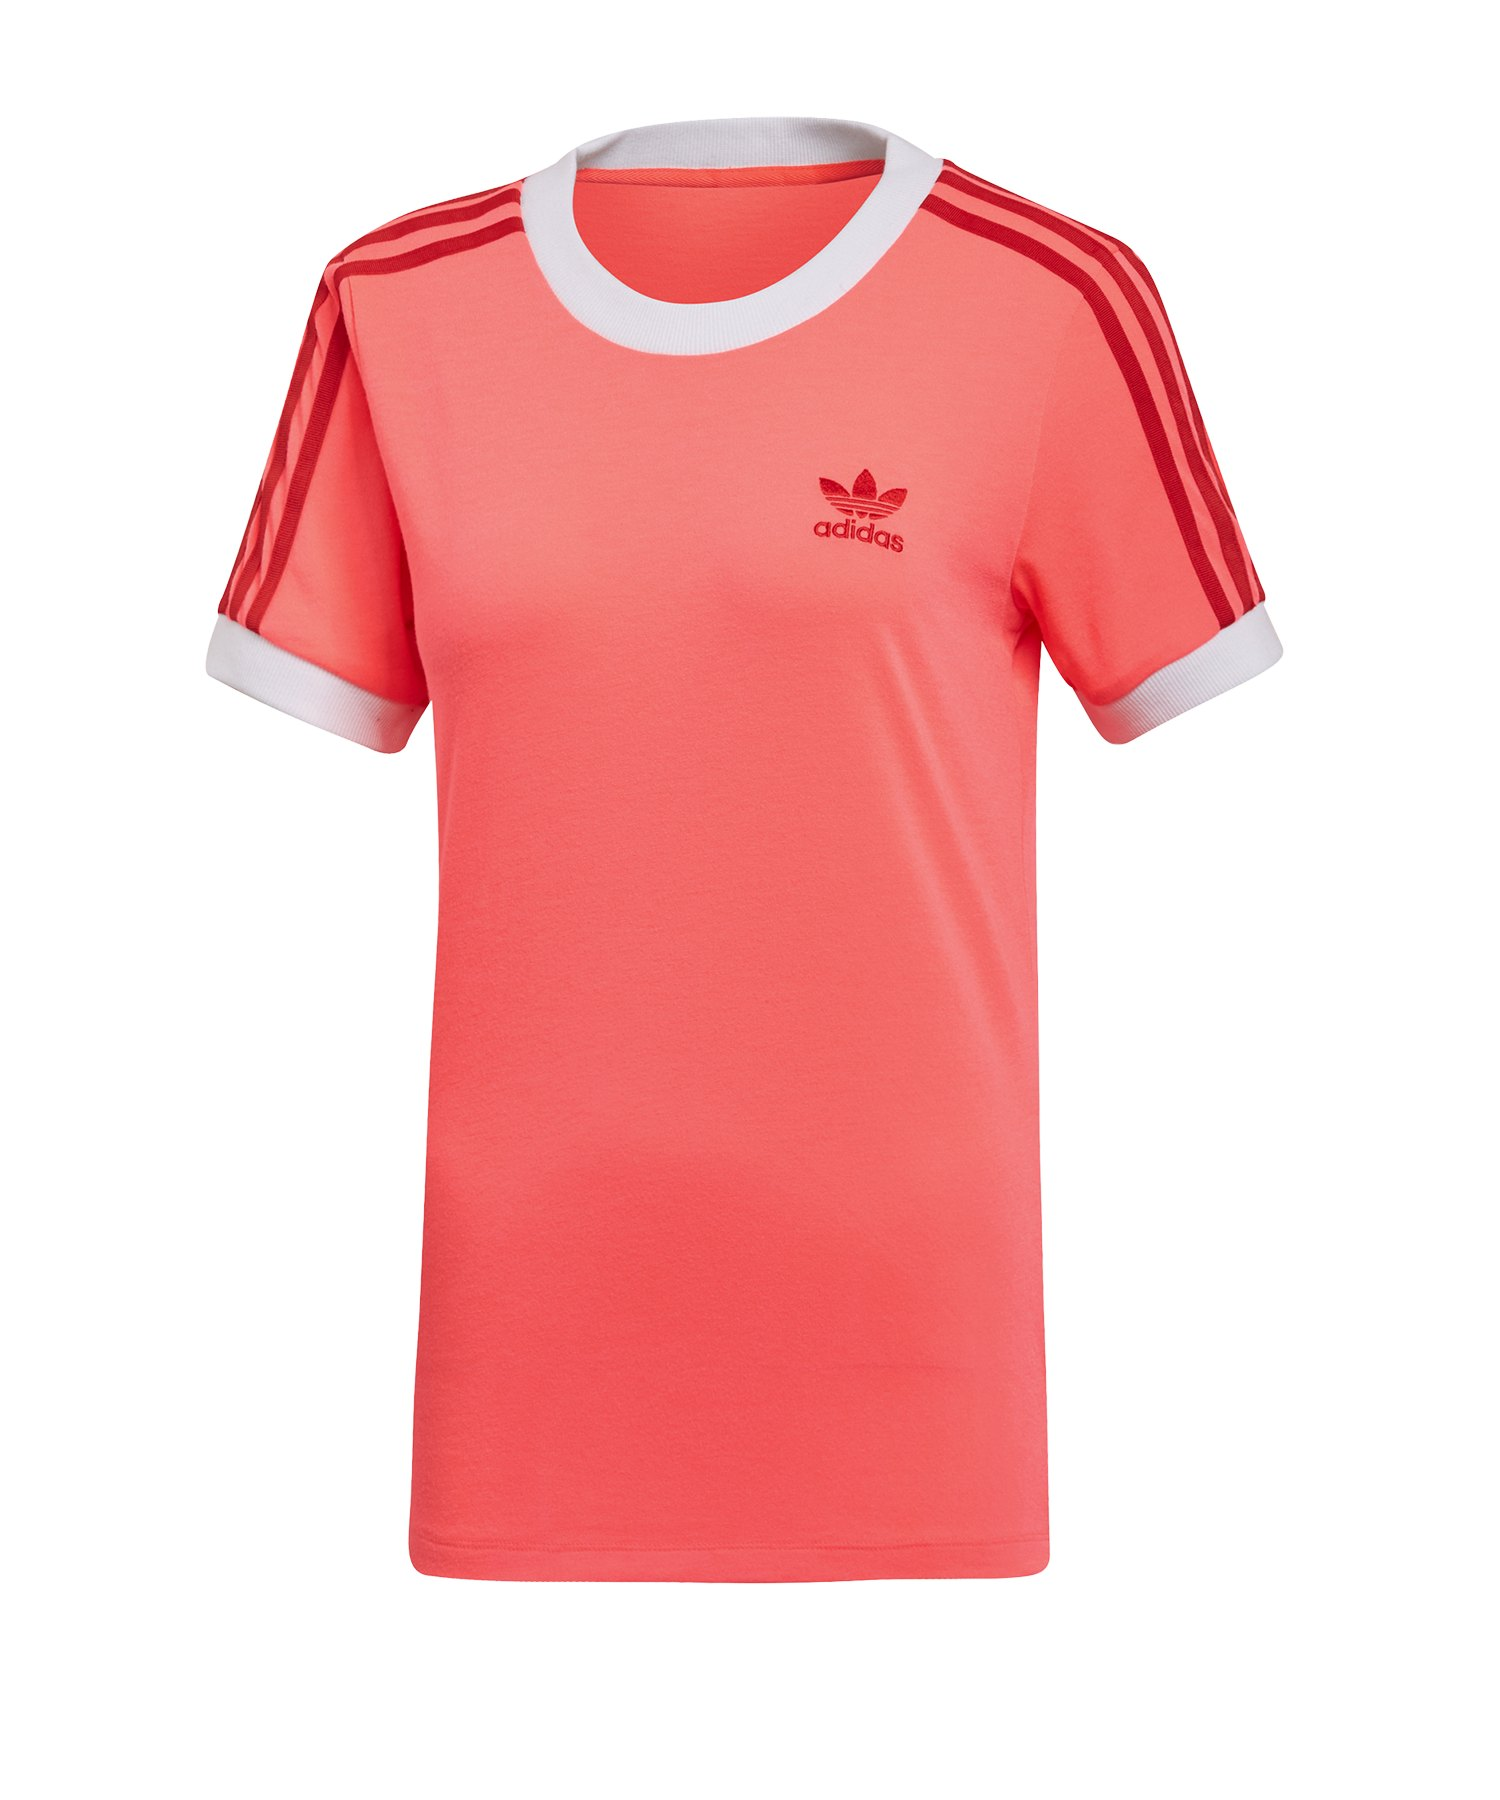 adidas Originals 3 Stripes T Shirt Damen Grün | Lifestyle